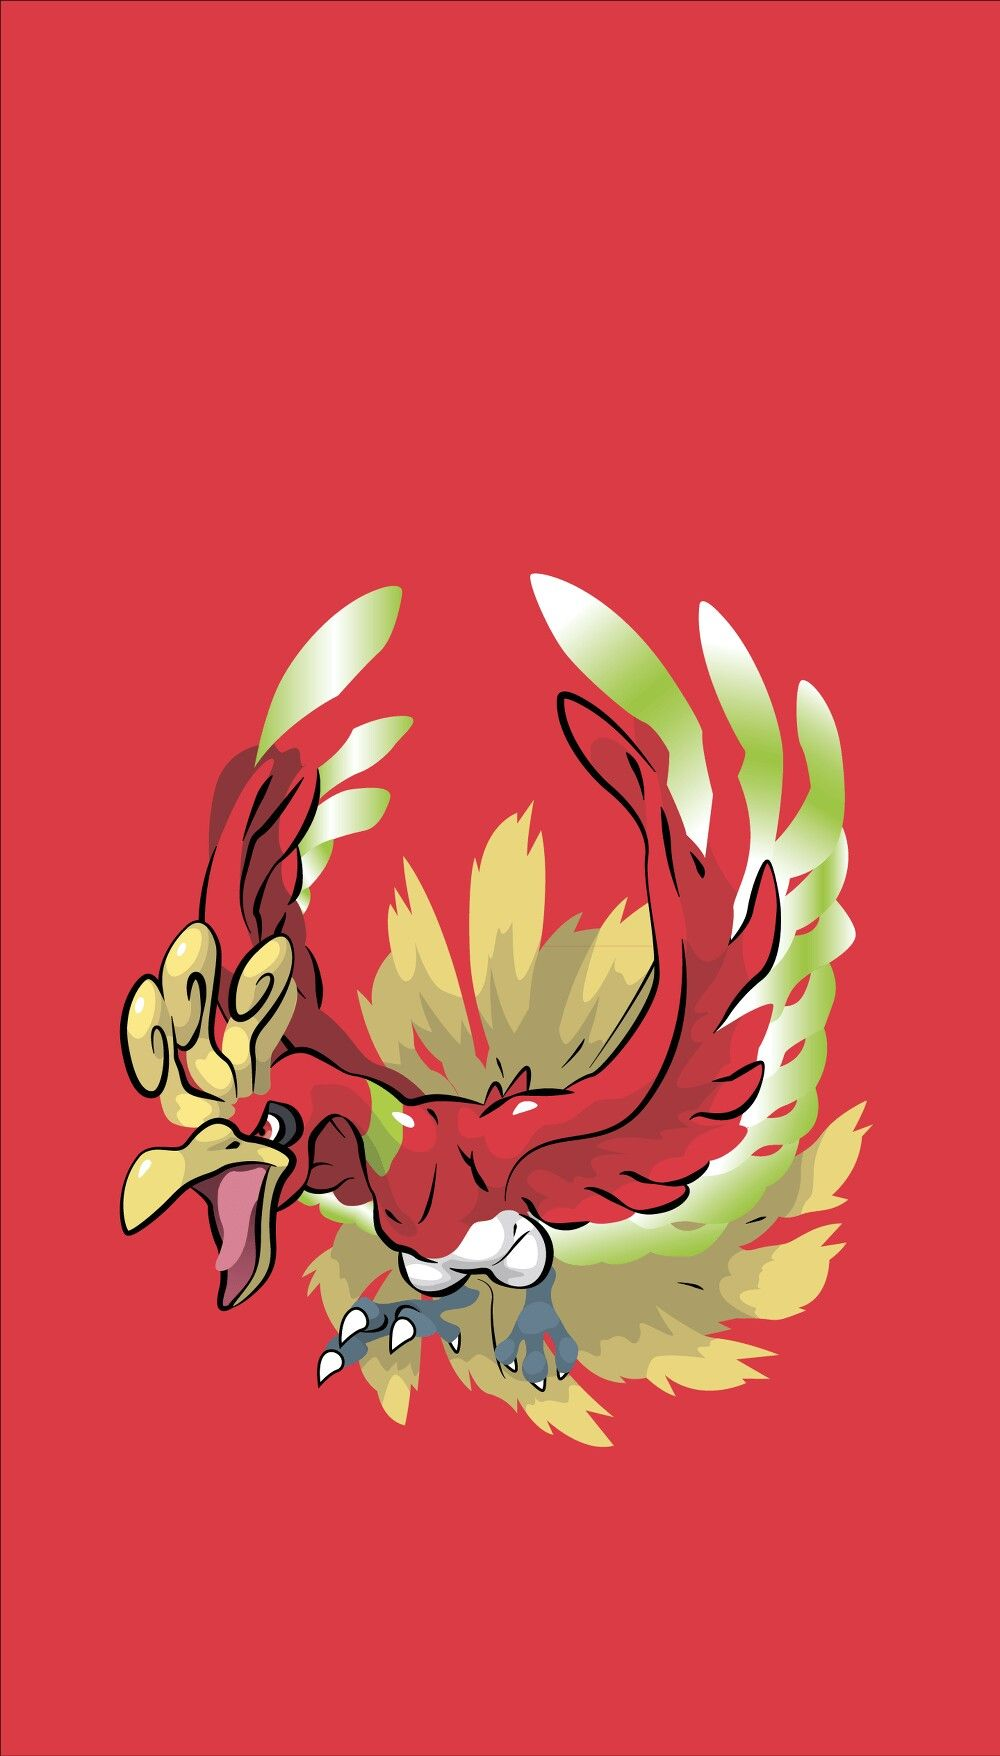 Ho Oh Wallpaper Cute Pokemon Wallpaper Pokemon Backgrounds Pokemon Art